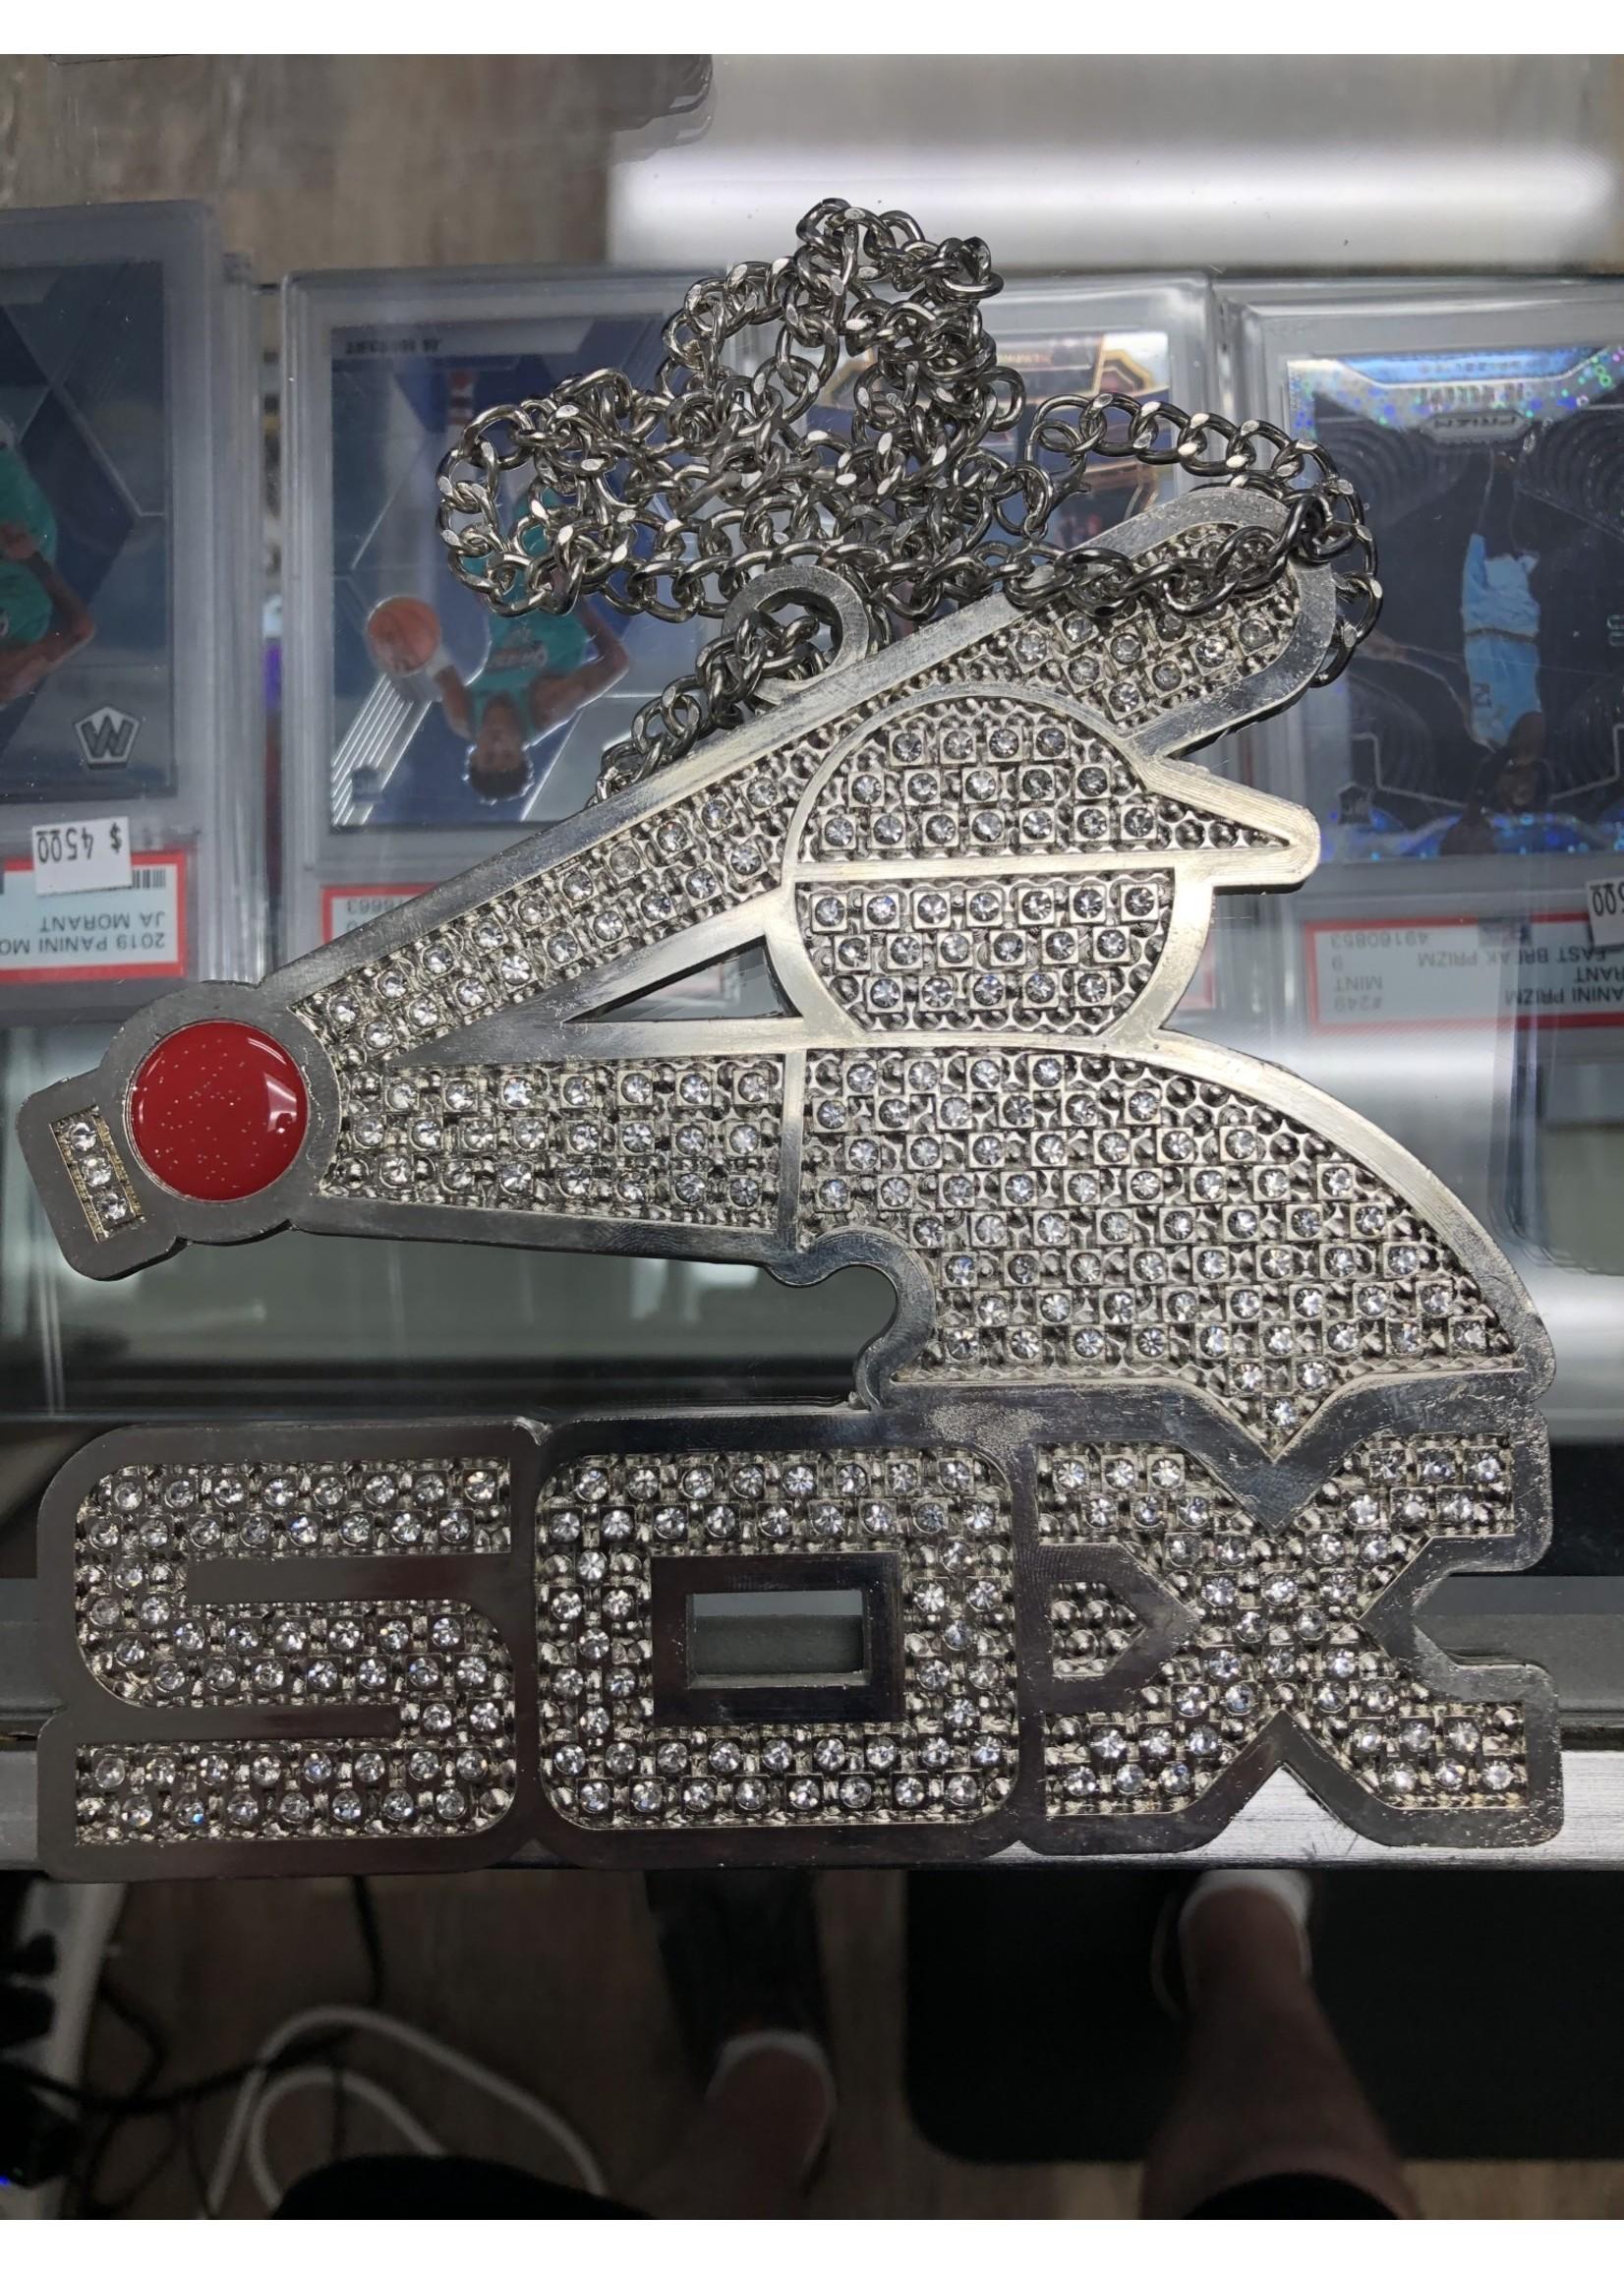 White Sox Diamond Chain